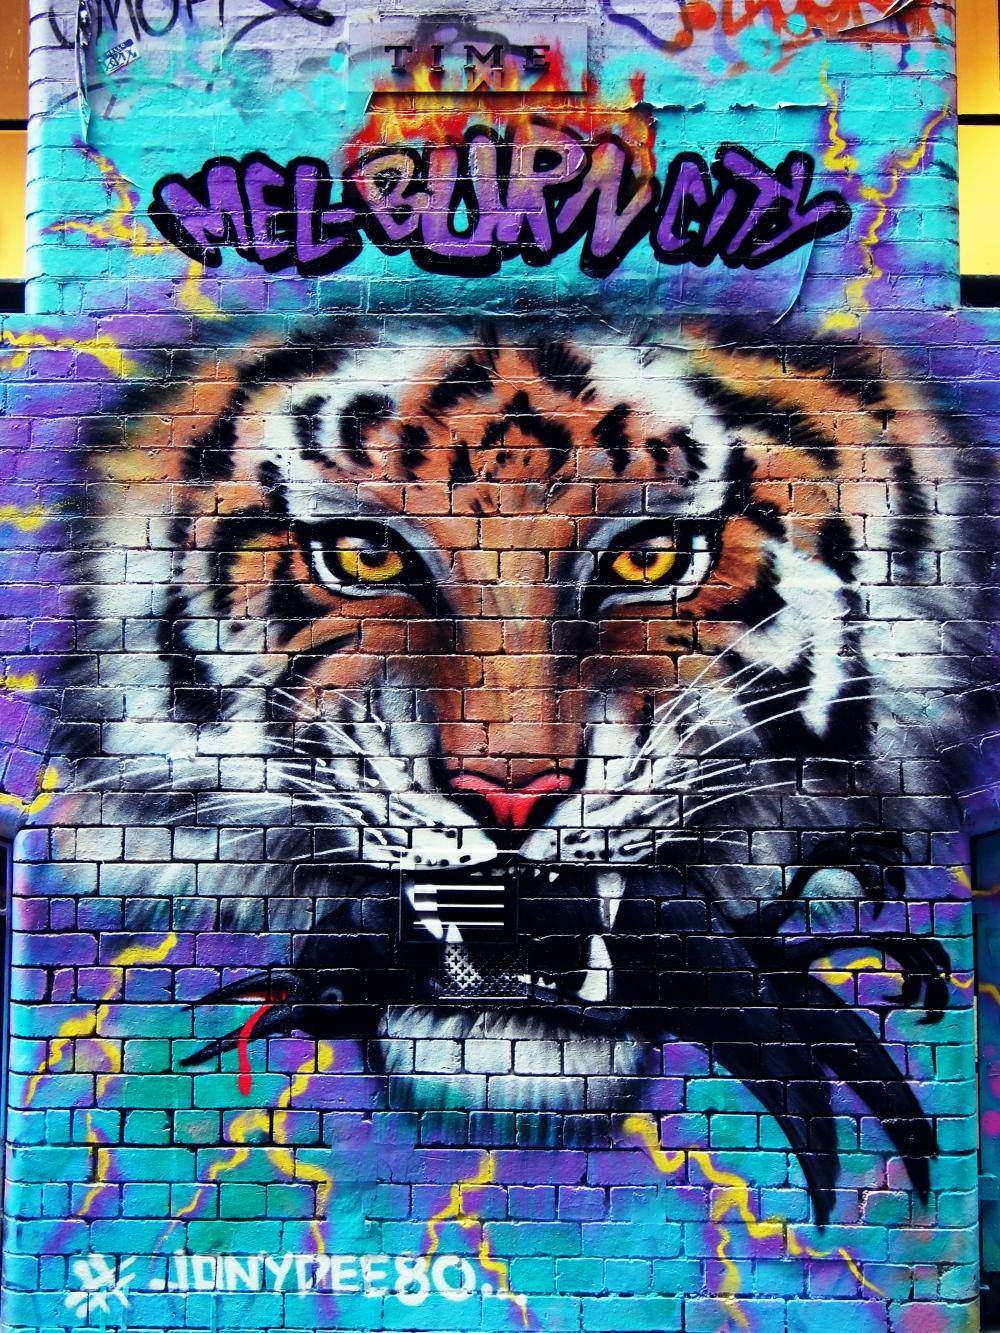 Melbourne_Tags3_Fotor.jpg